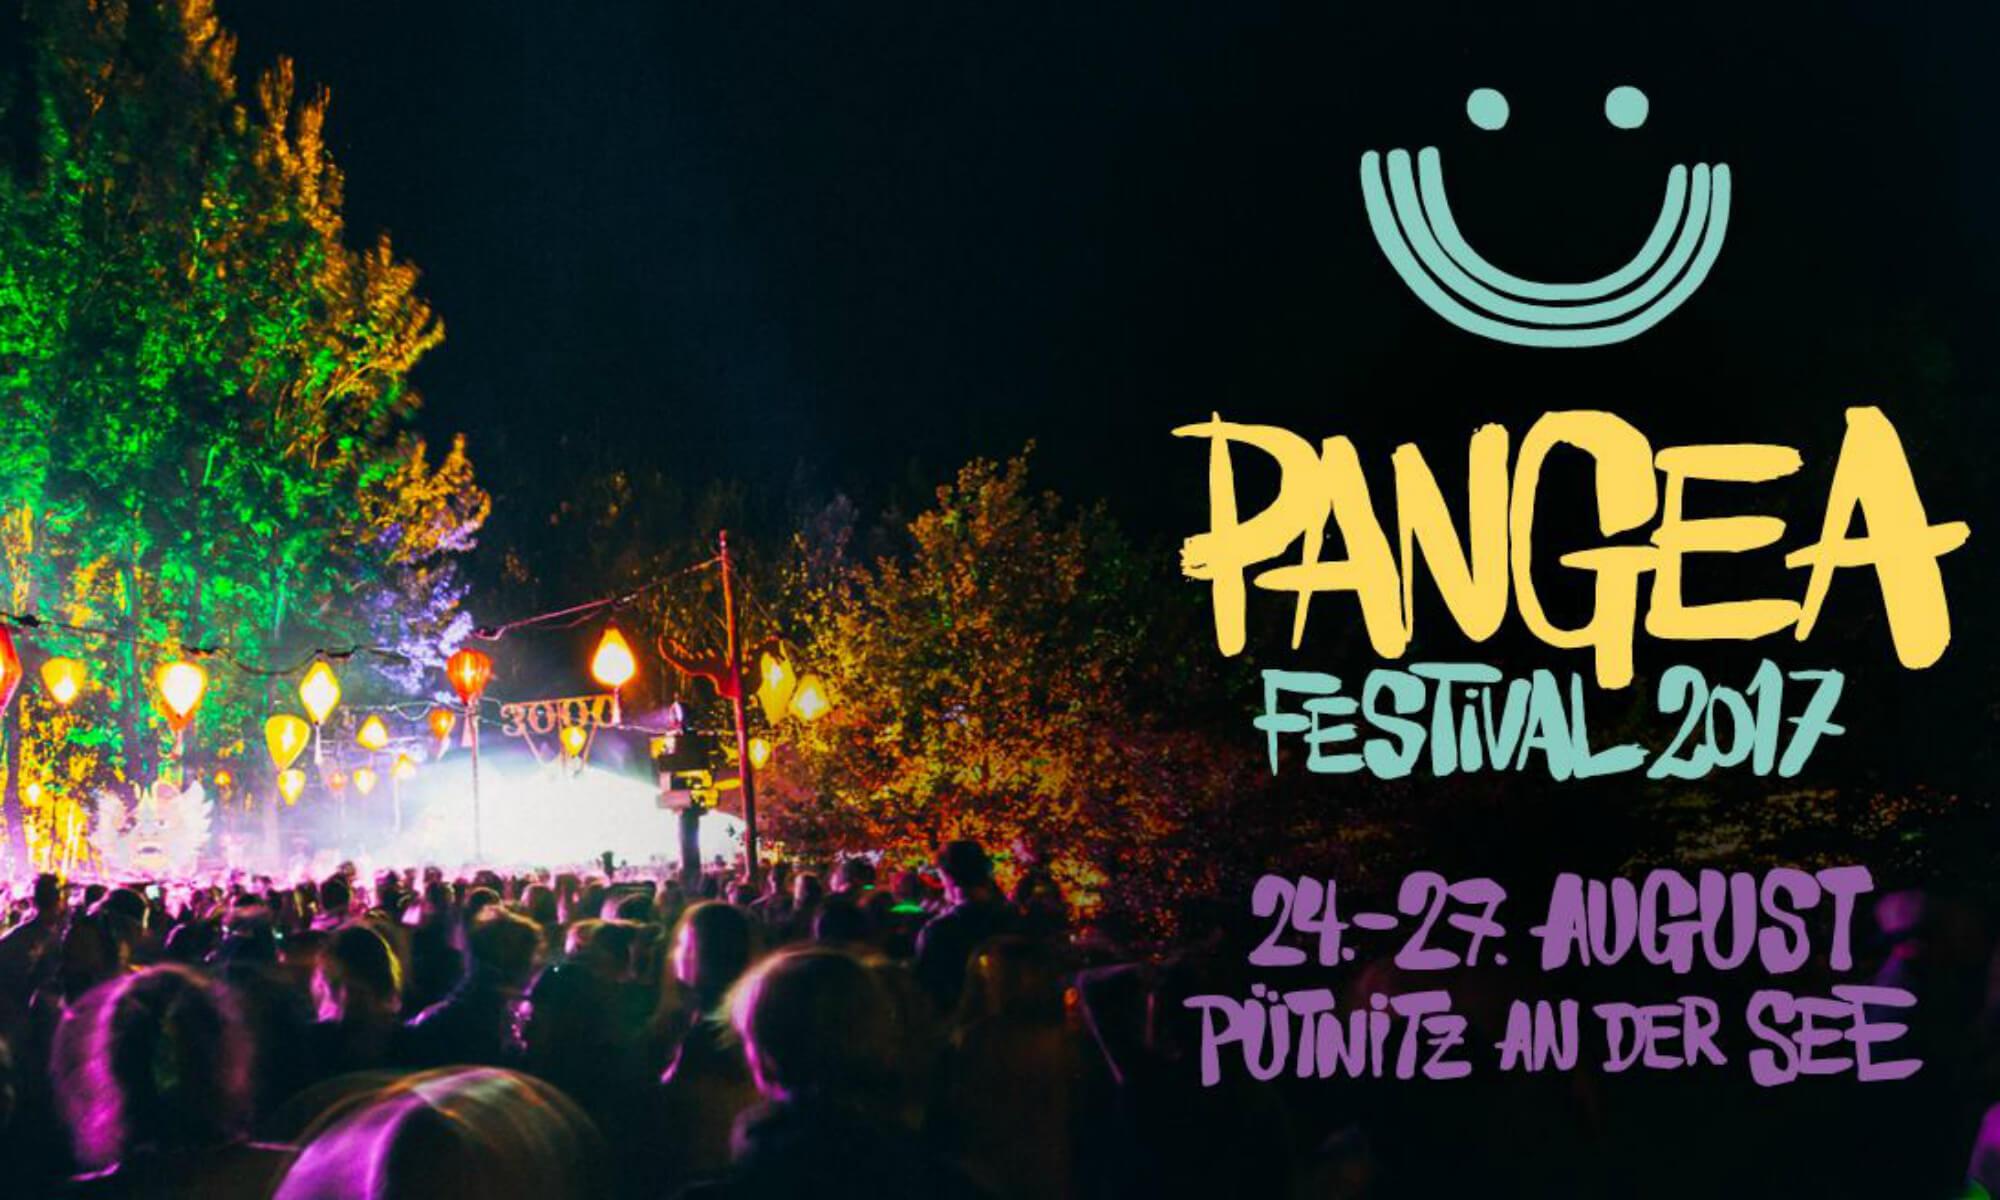 via Pangea Festival